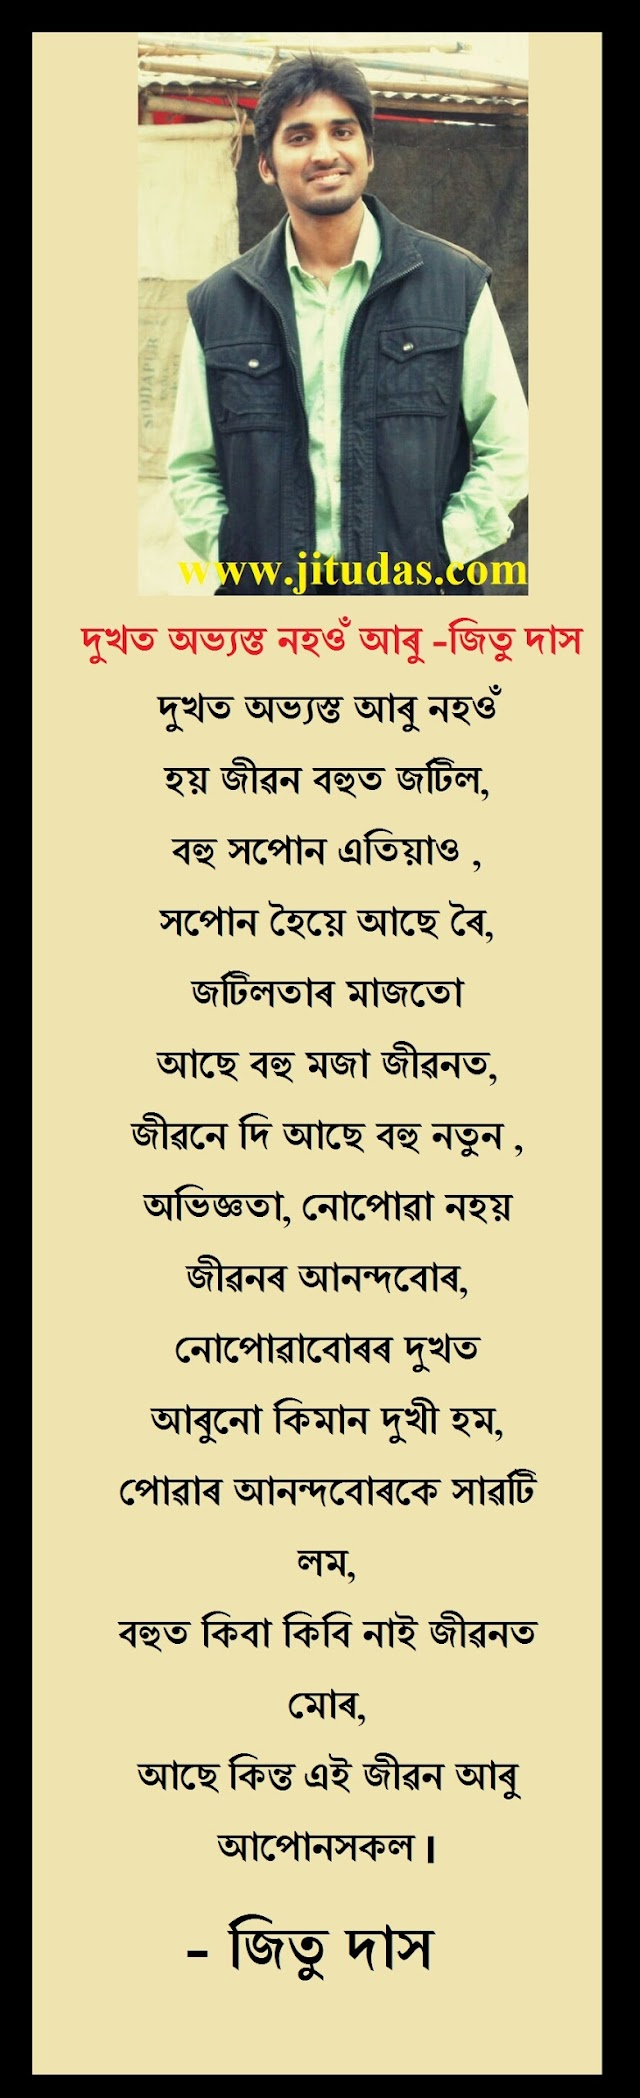 Assamese positive poems about life by Jitu Das poems 2017 ( অসমীয়া কবিতা- জিতু দাস কবিতা)